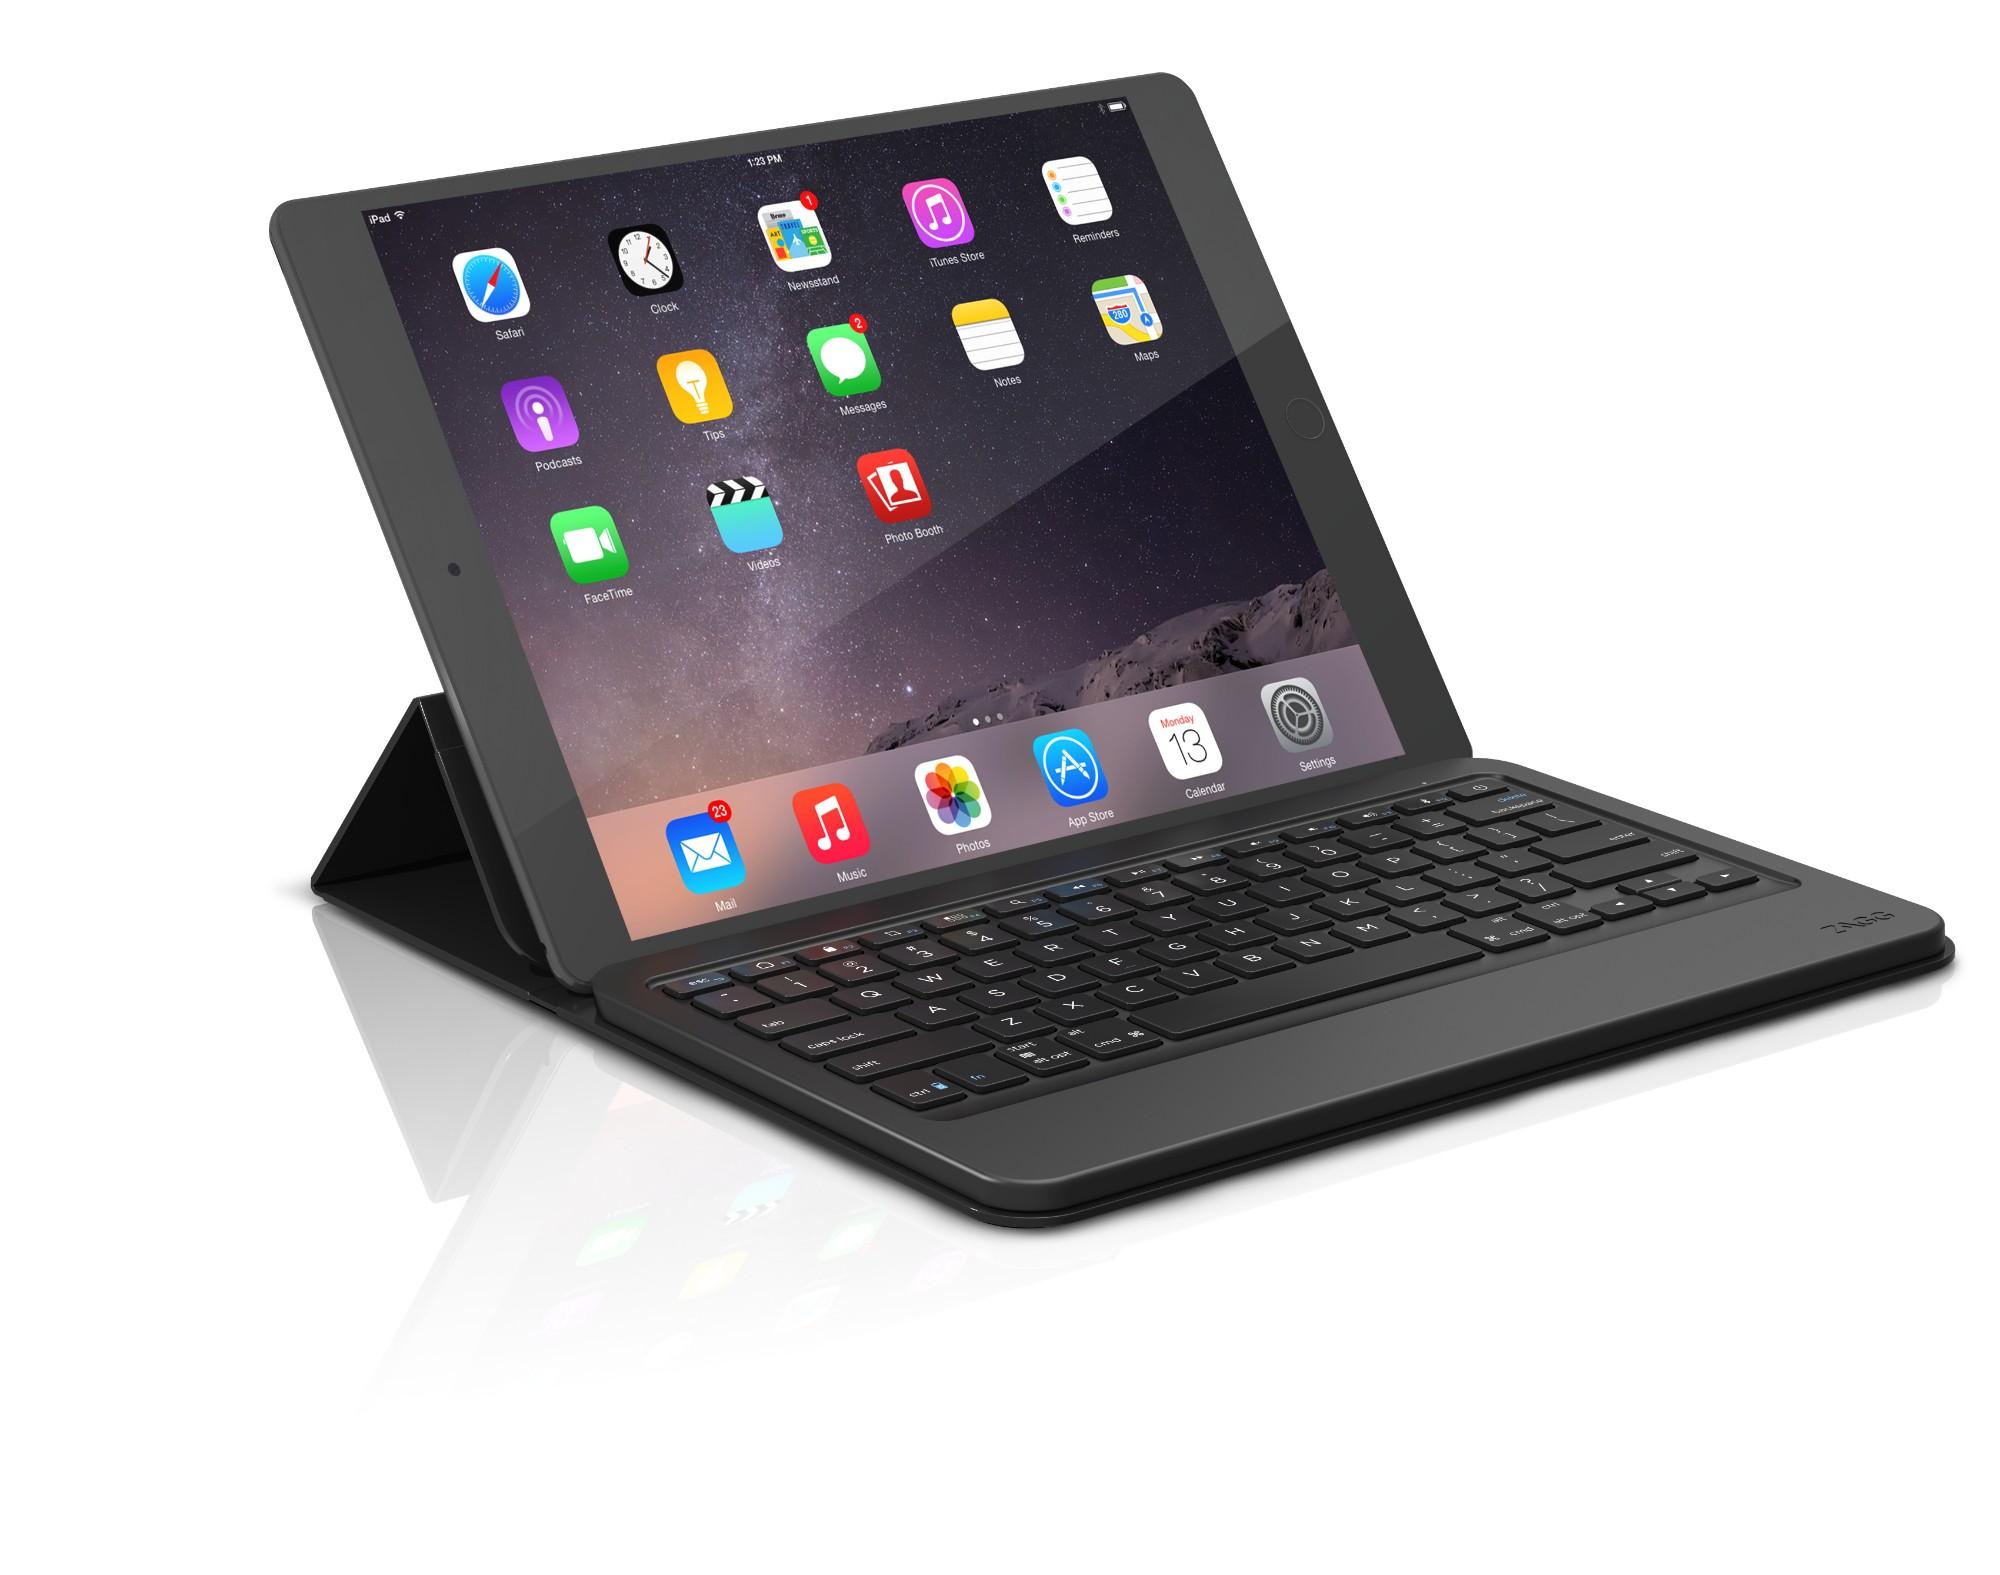 ZAGG Messenger universal toetsenbord voor mobiel apparaat QWERTY Brits Engels Zwart Bluetooth